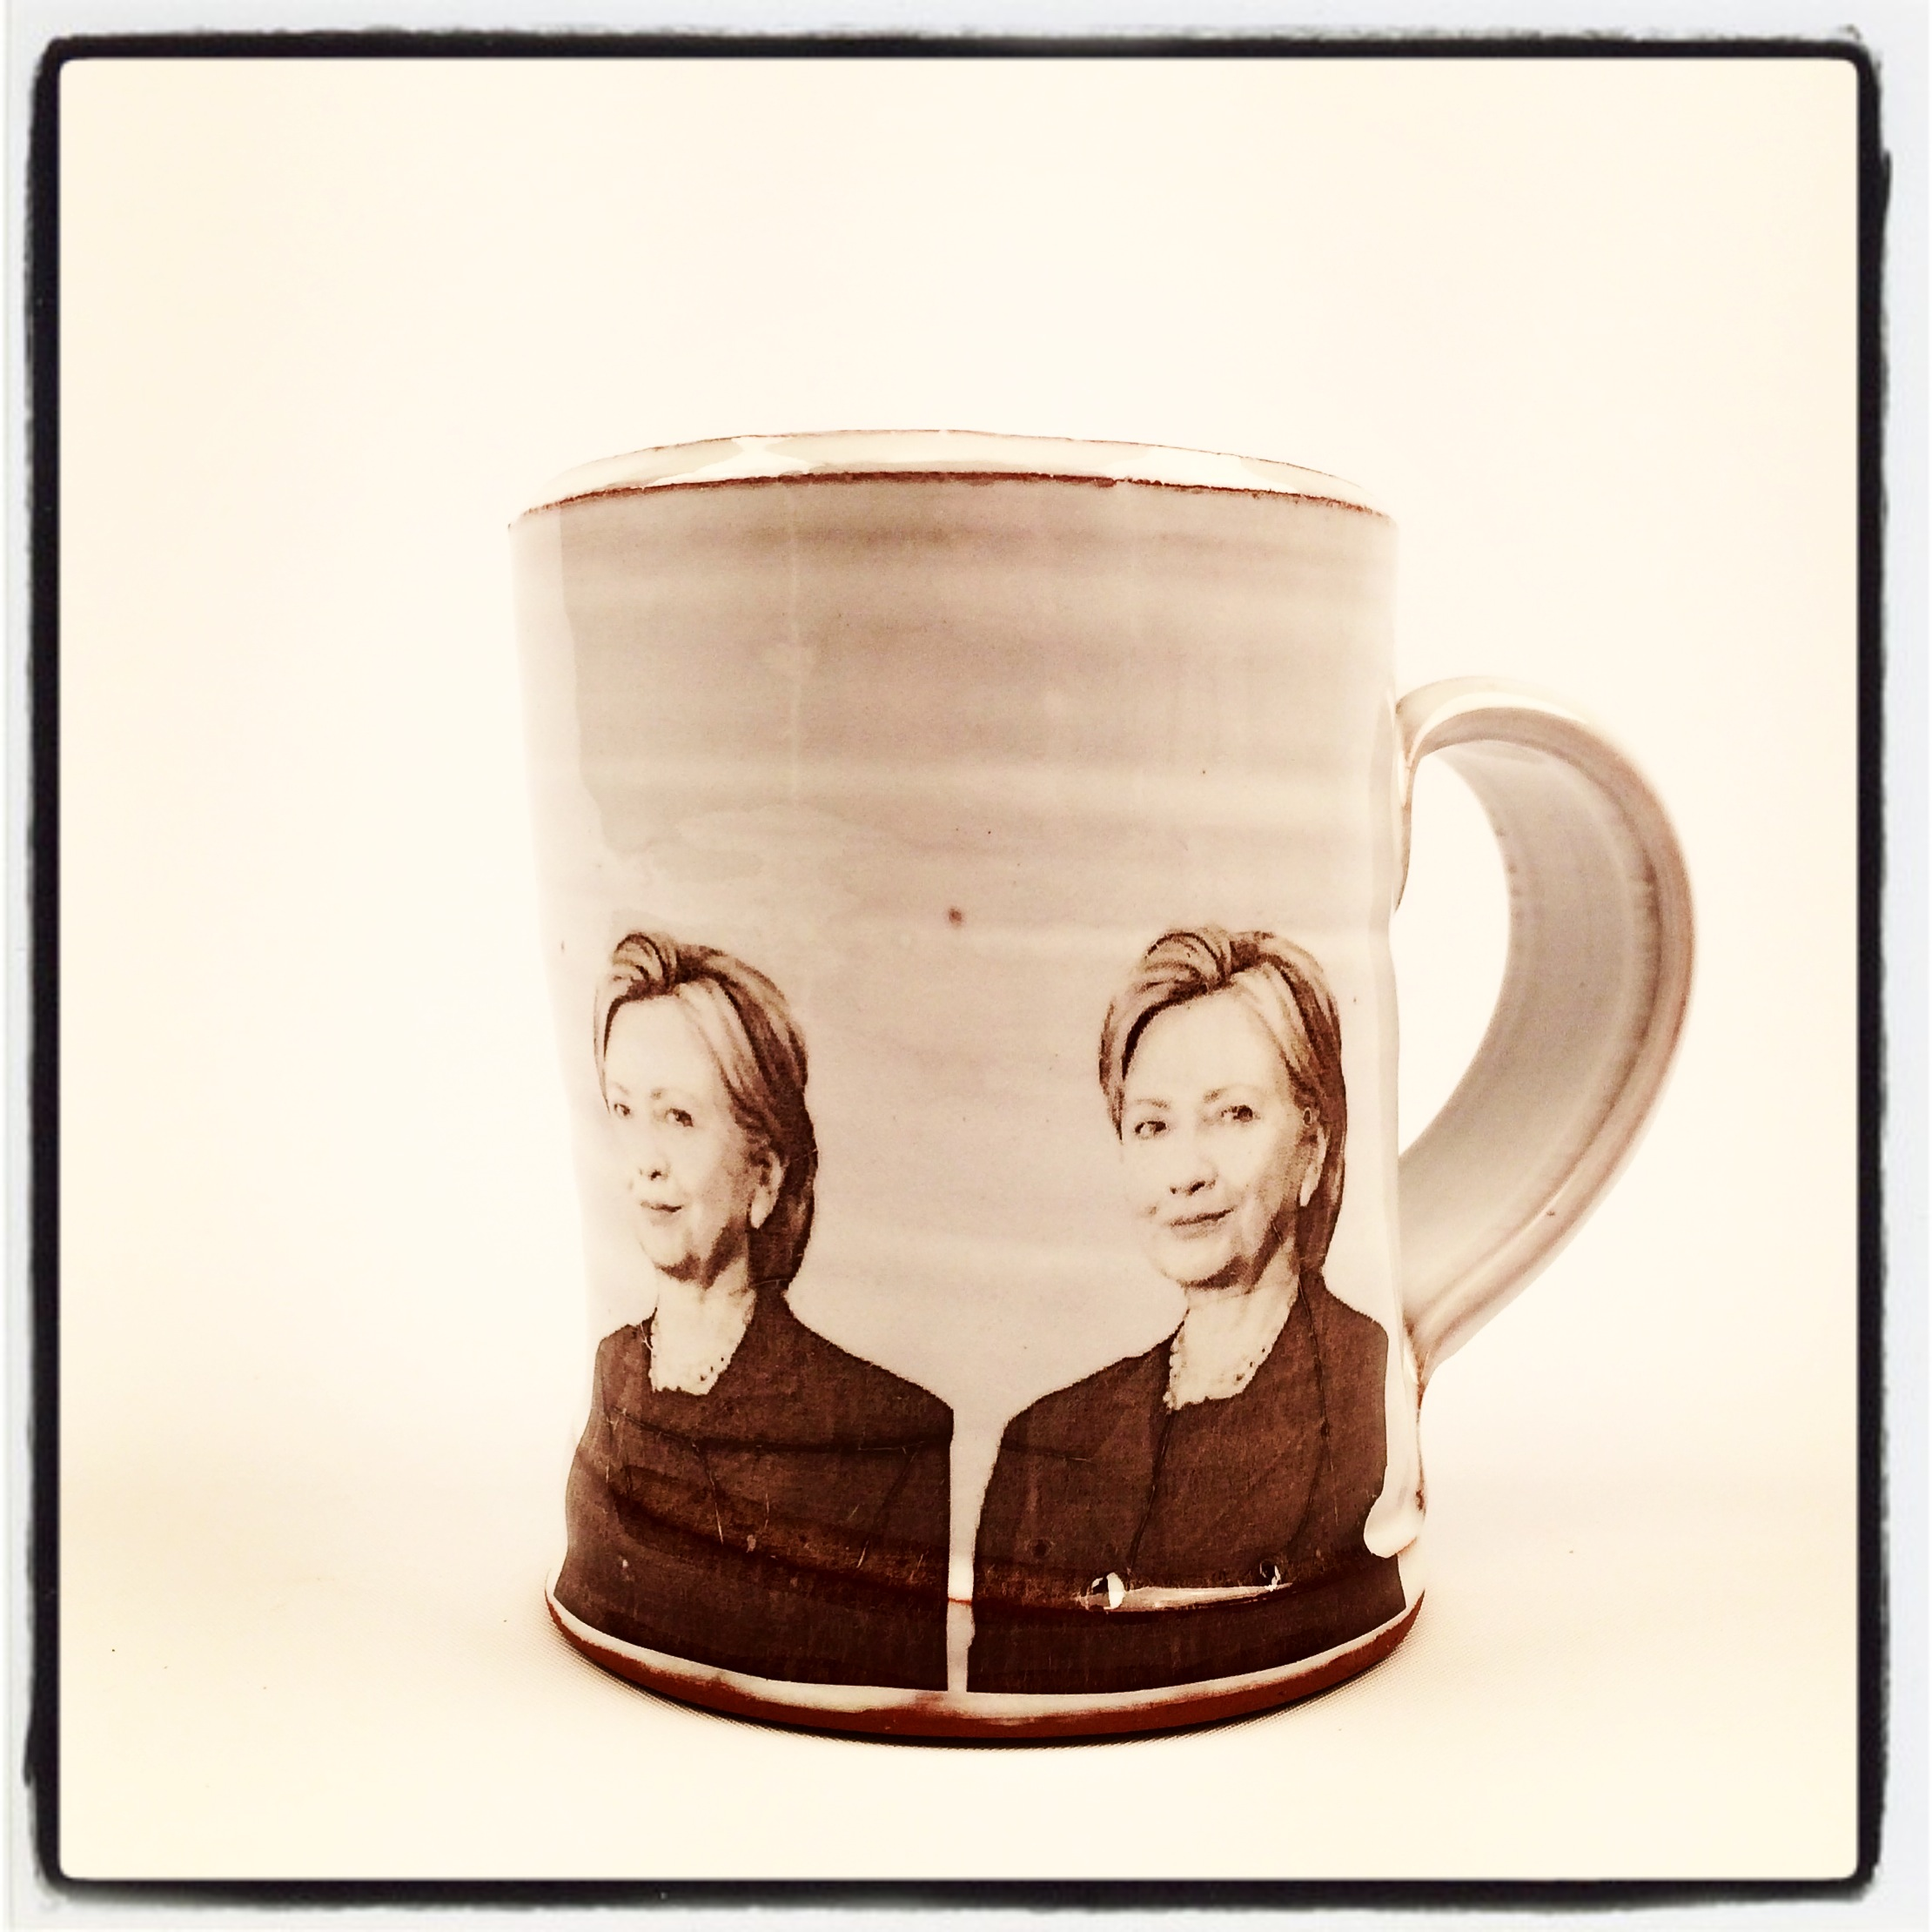 Hillary Clinton mug for sale on Etsy, made by ceramic artist Justin Rothshank.